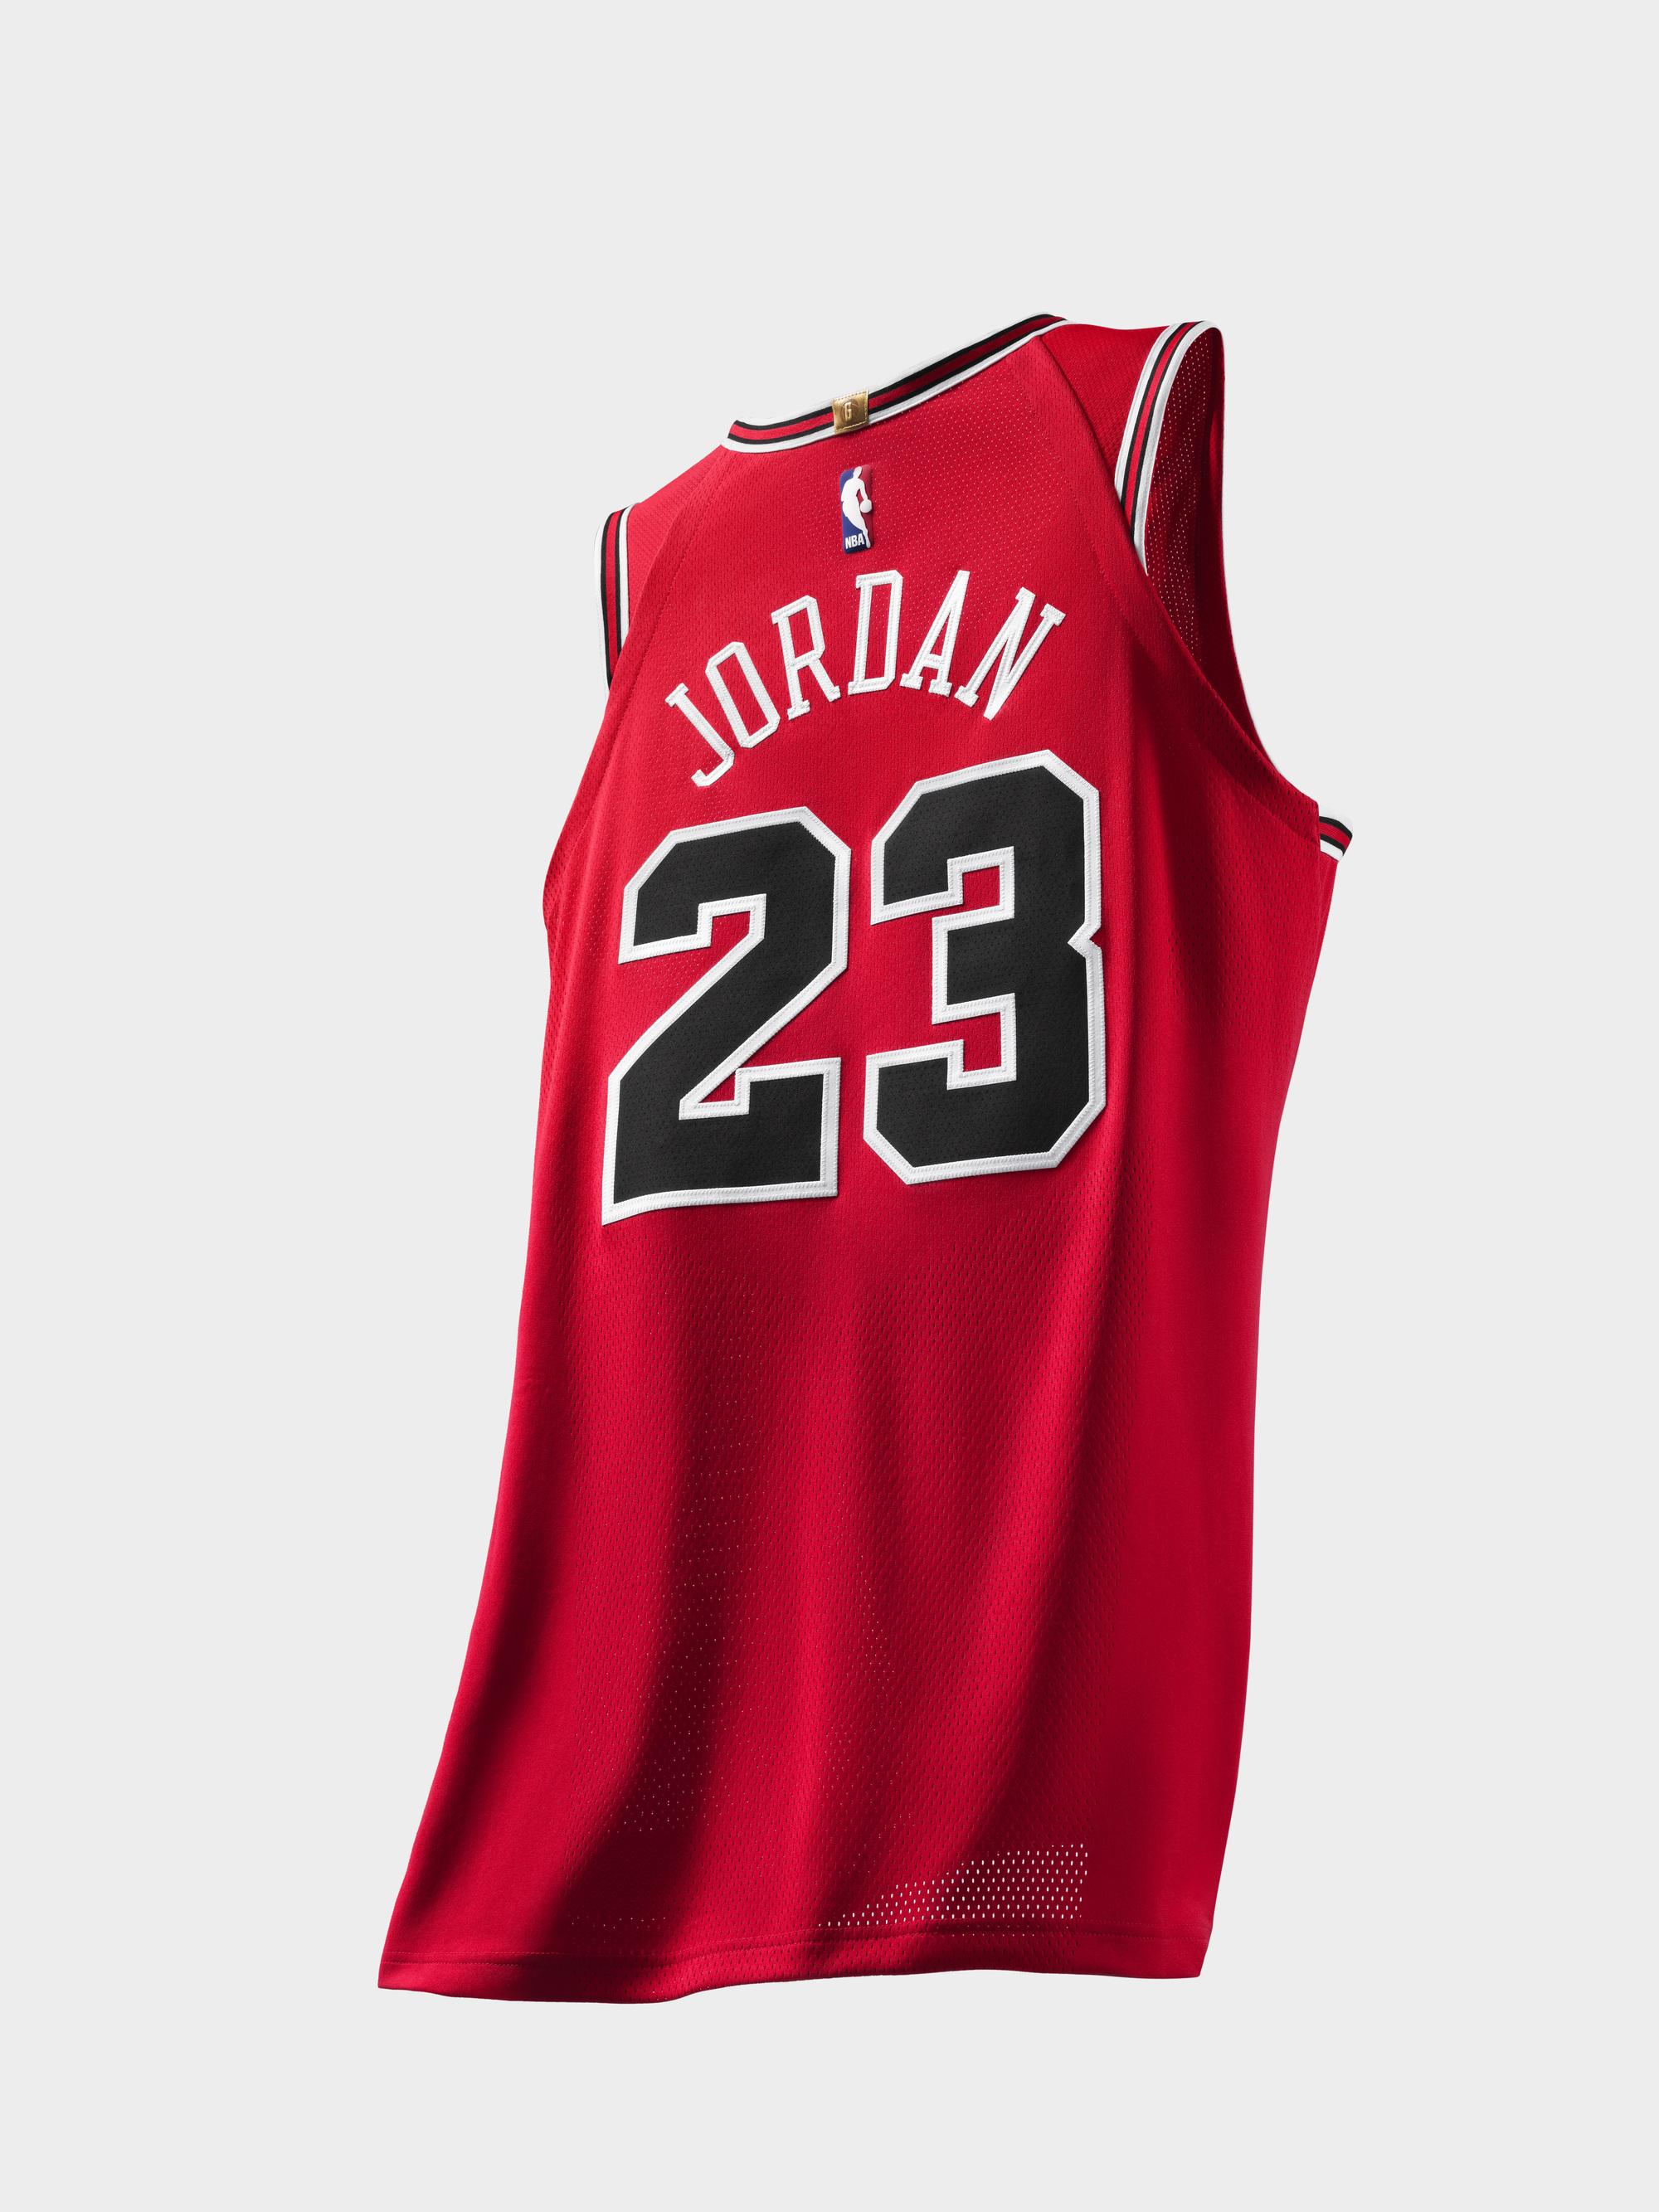 Nike Unveils Limited Edition Michael Jordan Bulls Jerseys